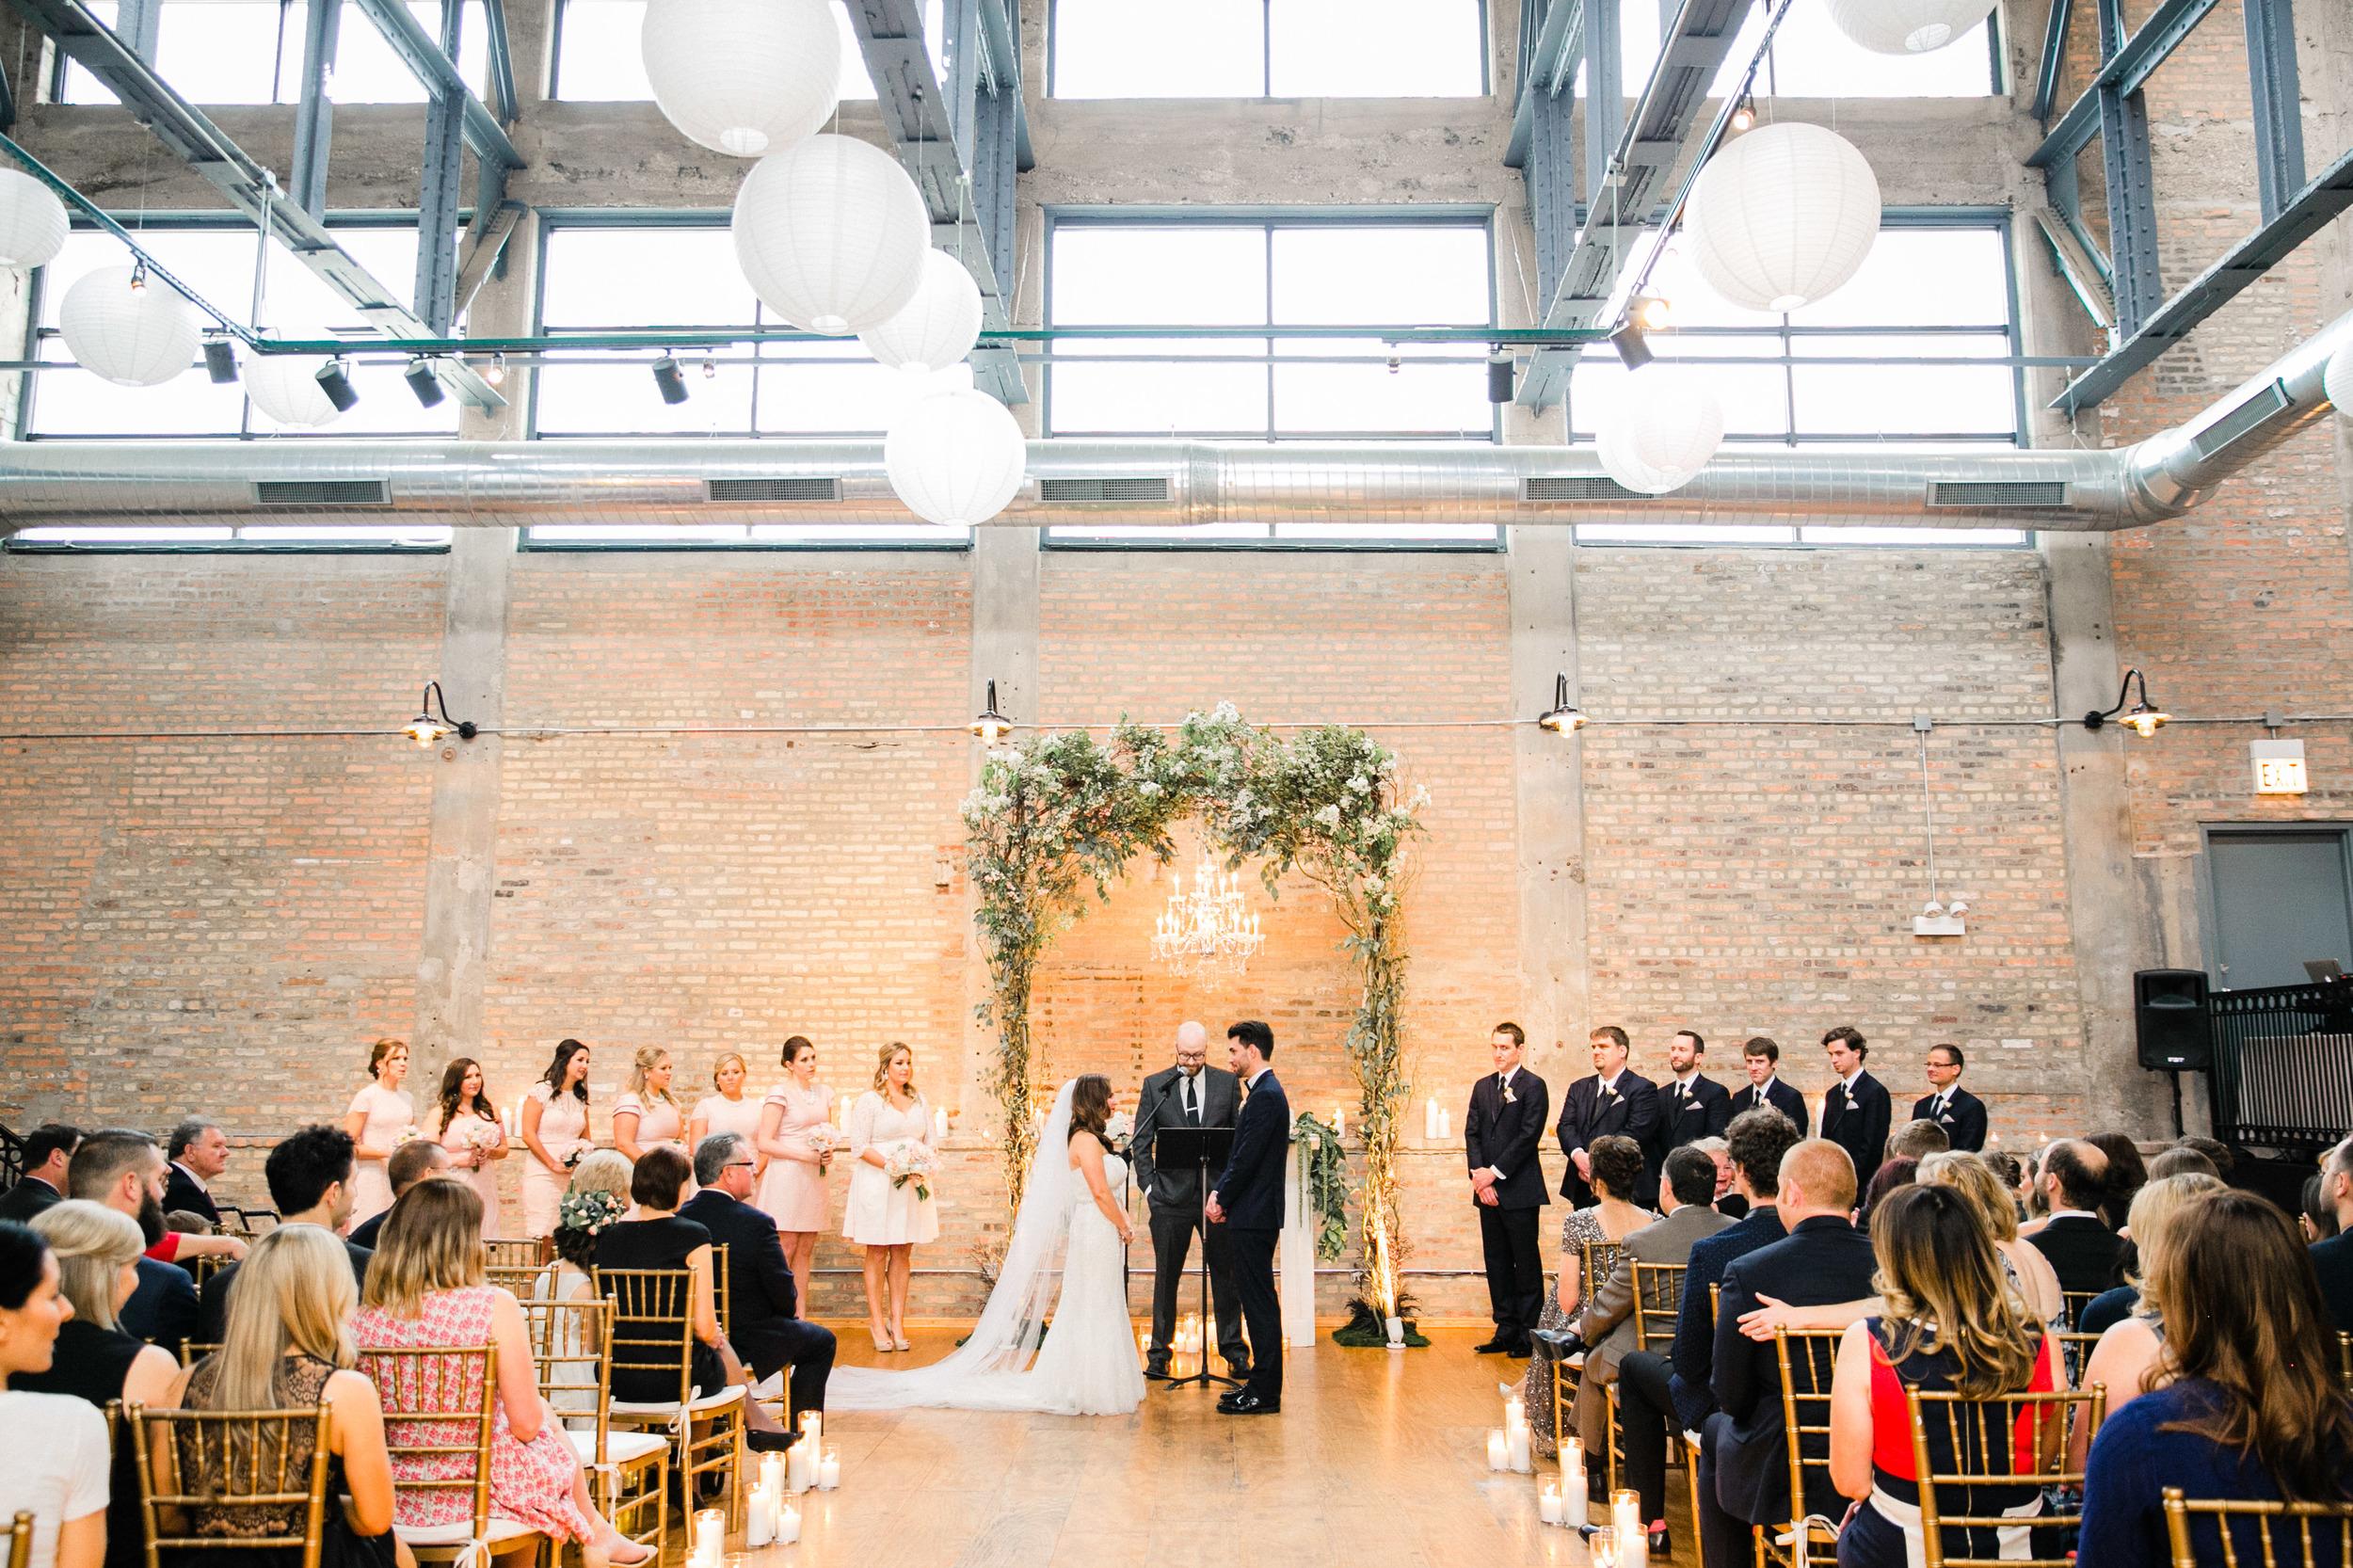 mayden_photography_weddings-116.jpg